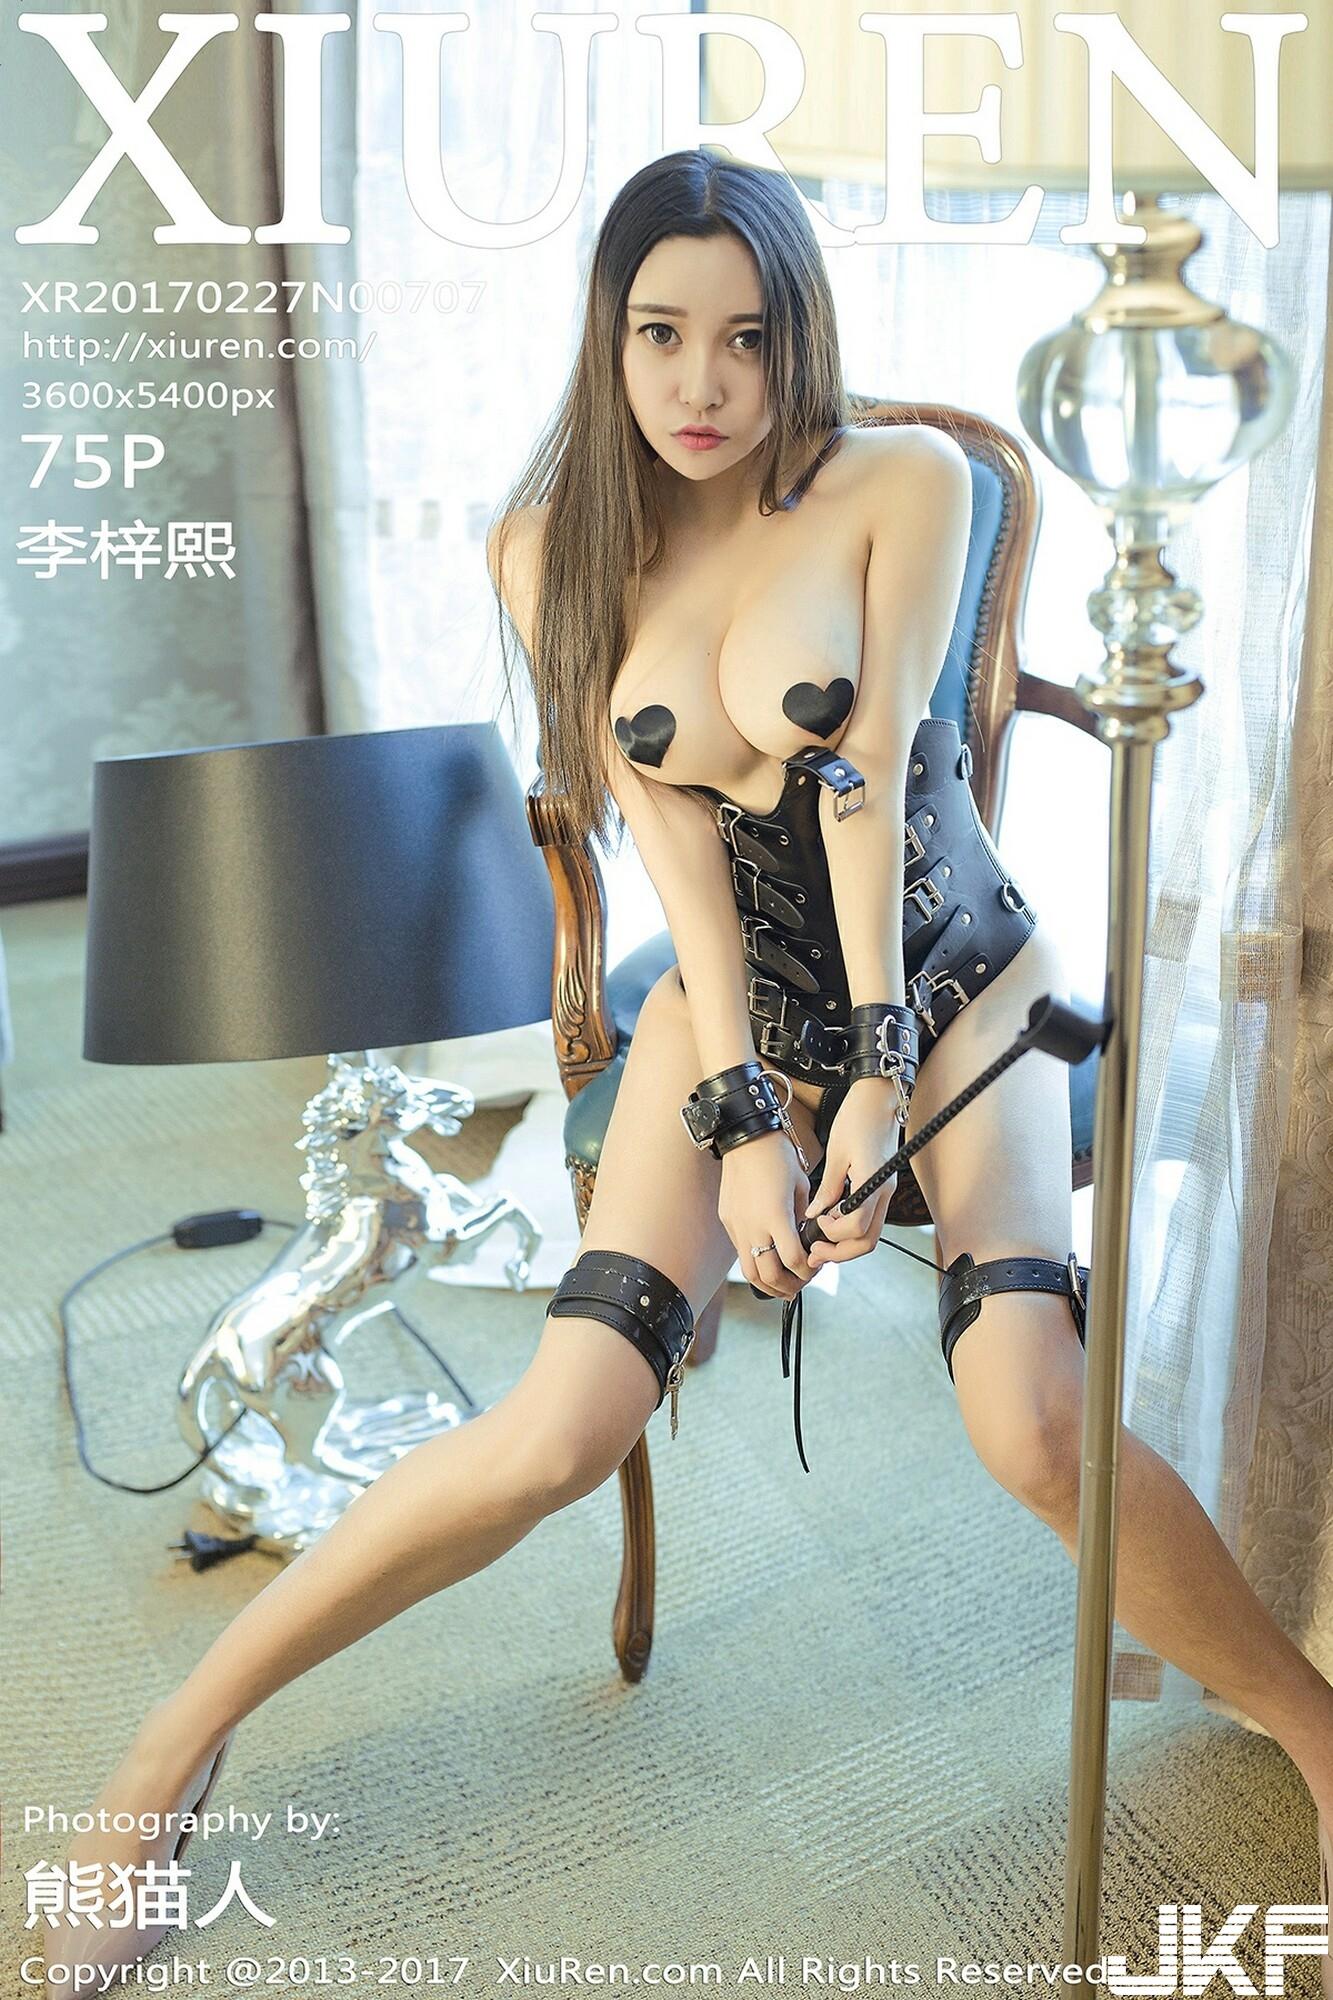 【Xiuren秀人網系列】2017.02.27 No.707 李梓熙 性感寫真【76P】 - 貼圖 - 絲襪美腿 -